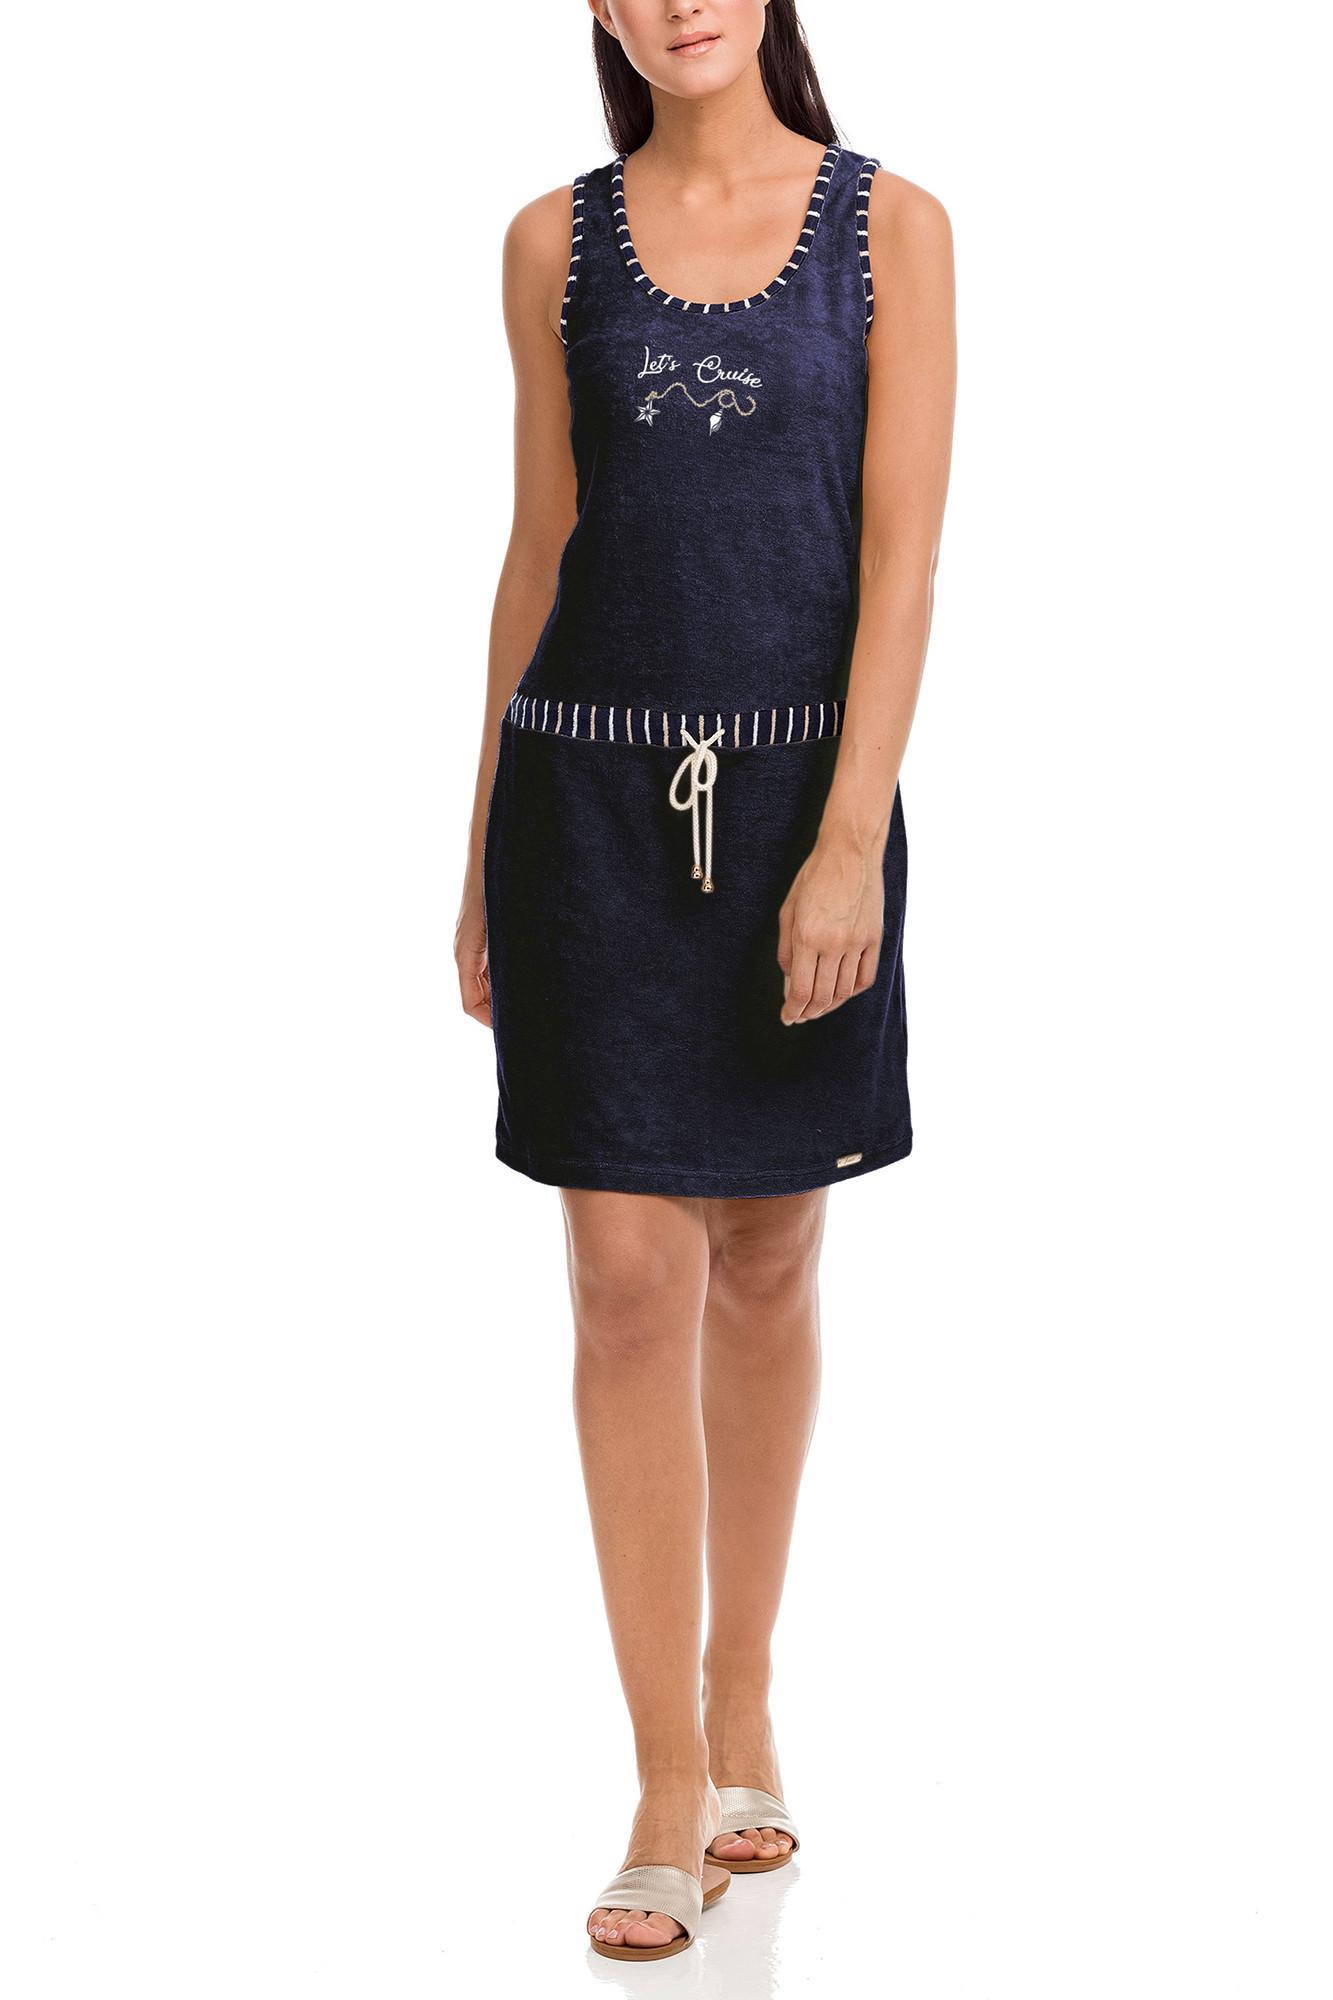 Vamp - Dámske šaty 12578 - Vamp blue s